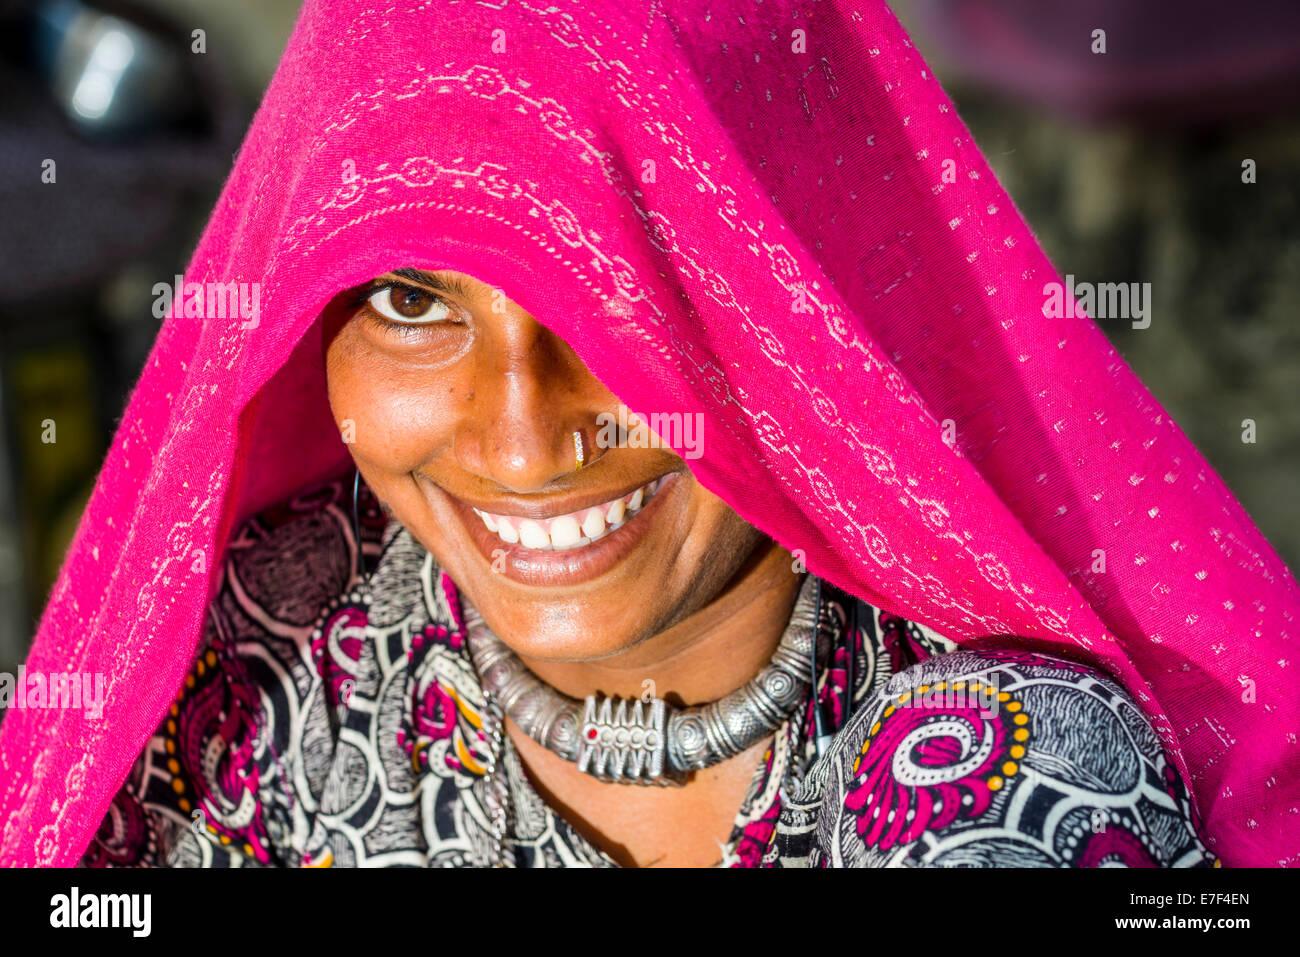 Une jeune femme portant un voile rose, Mumbai, Maharashtra, Inde Photo Stock